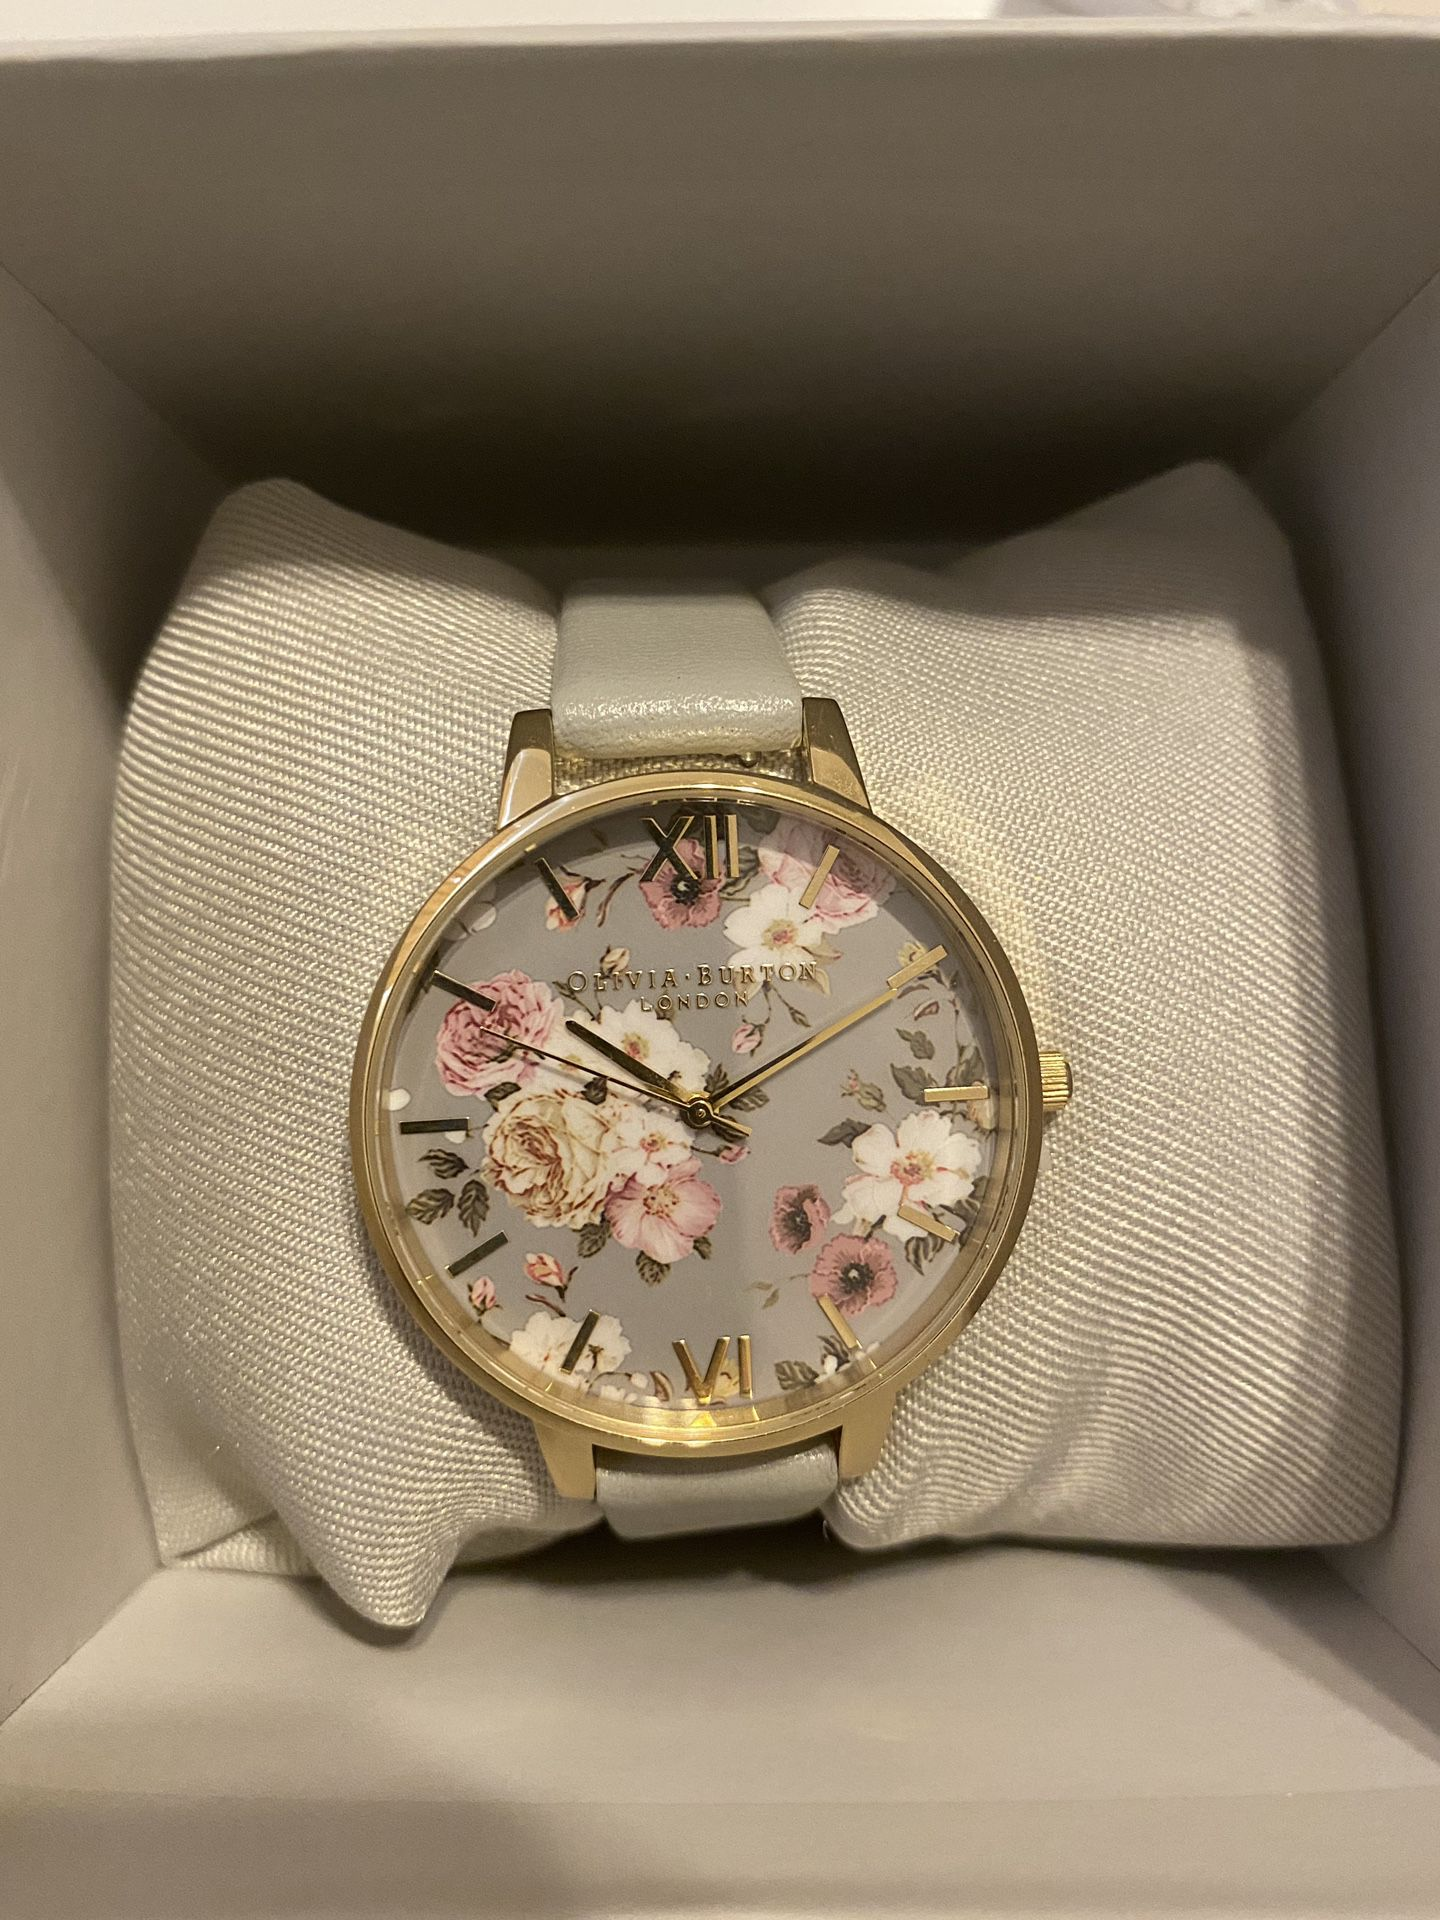 Brand new Olivia burton watch